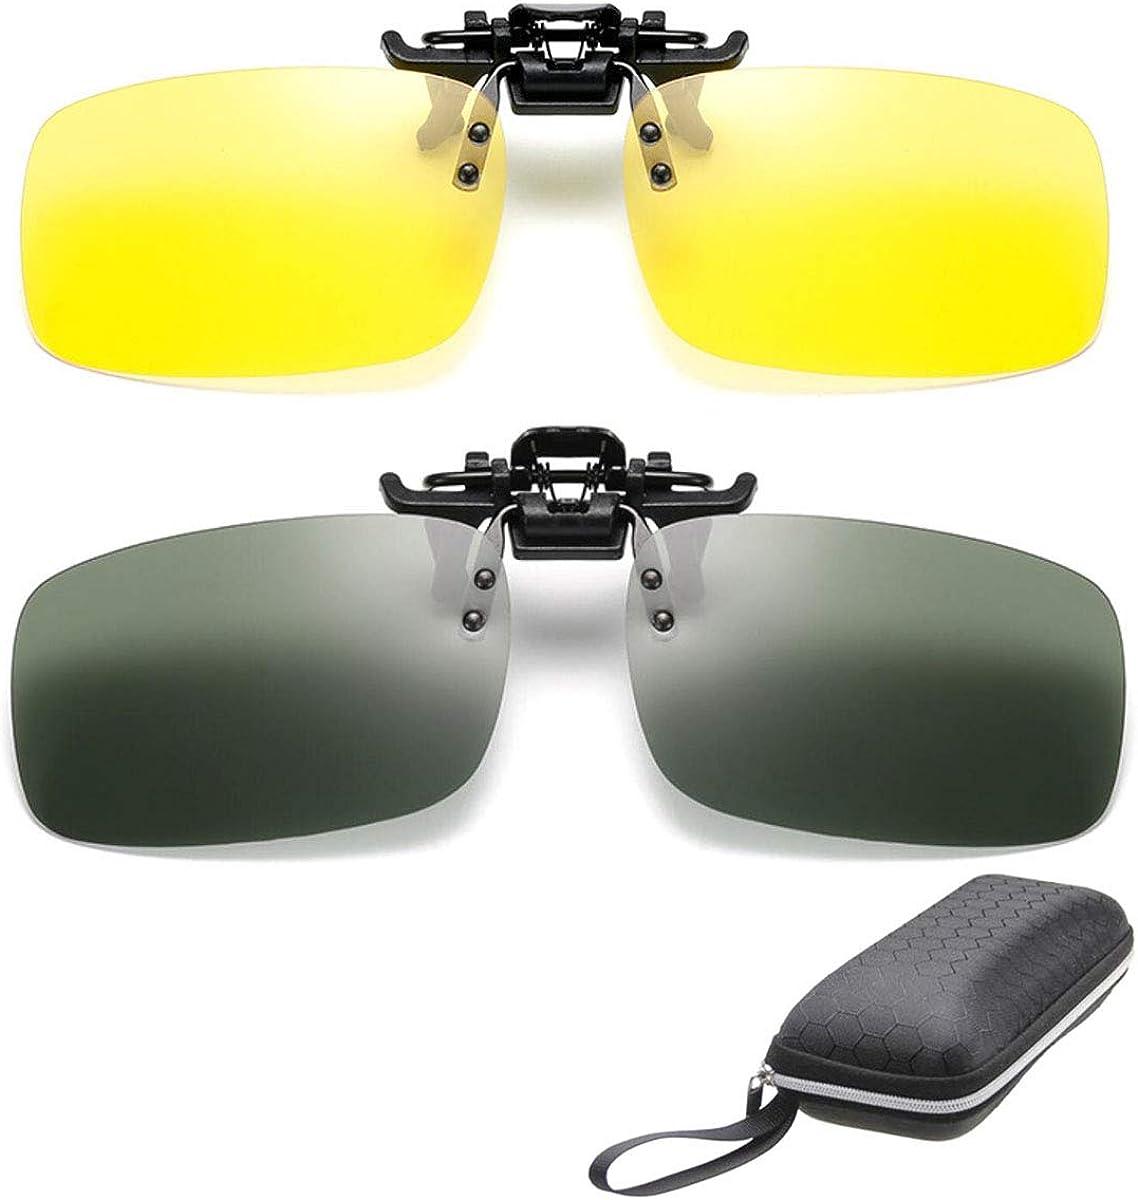 2 pares de gafas de sol Clip On Flip Up gafas de visión nocturna antideslumbrante polarizadas para hombres mujeres UV400 mejor para conducir Golf Shooting Caza de pesca deportes al aire libre